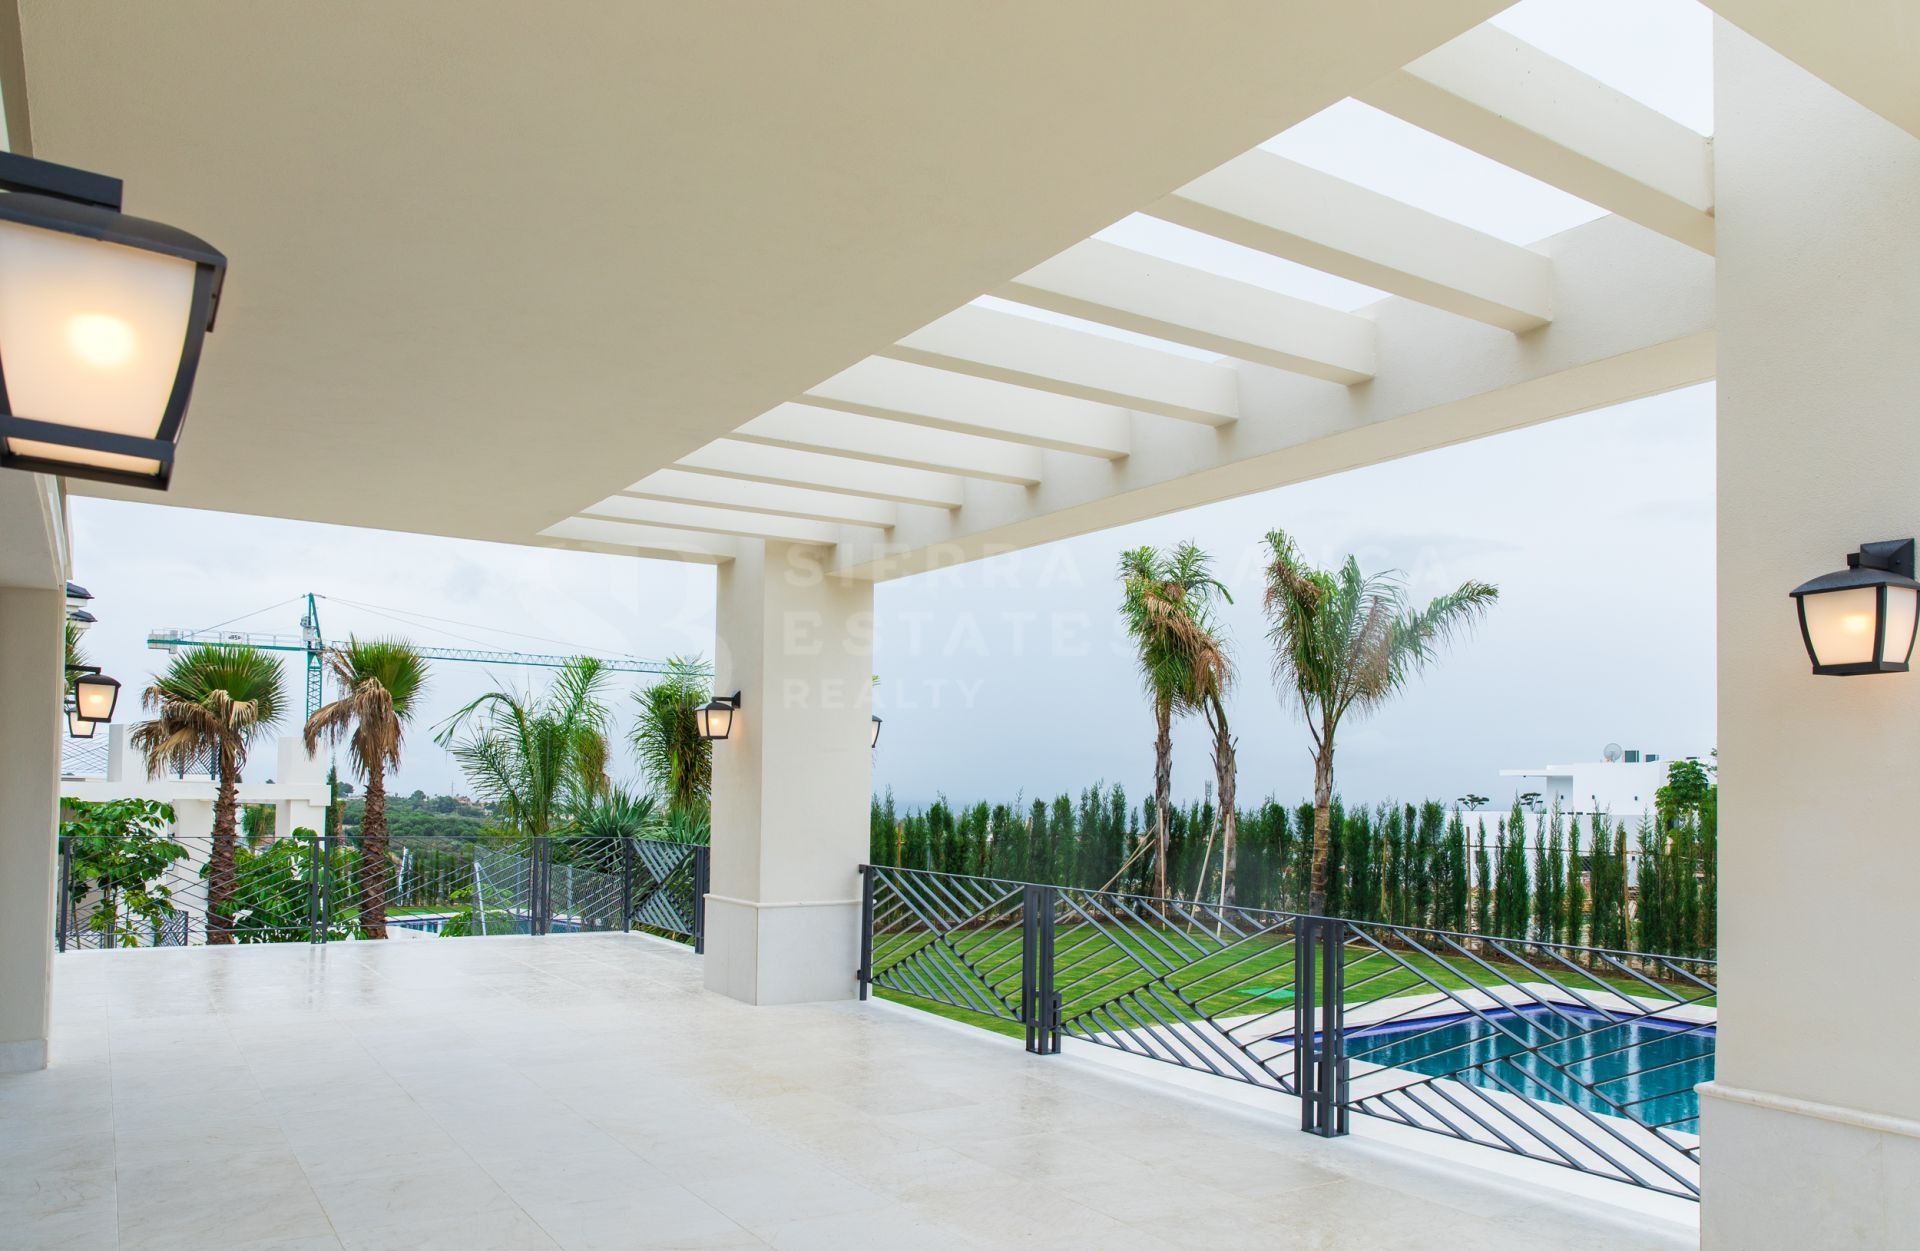 Beautiful Villa in the Heart of Los Flamingos